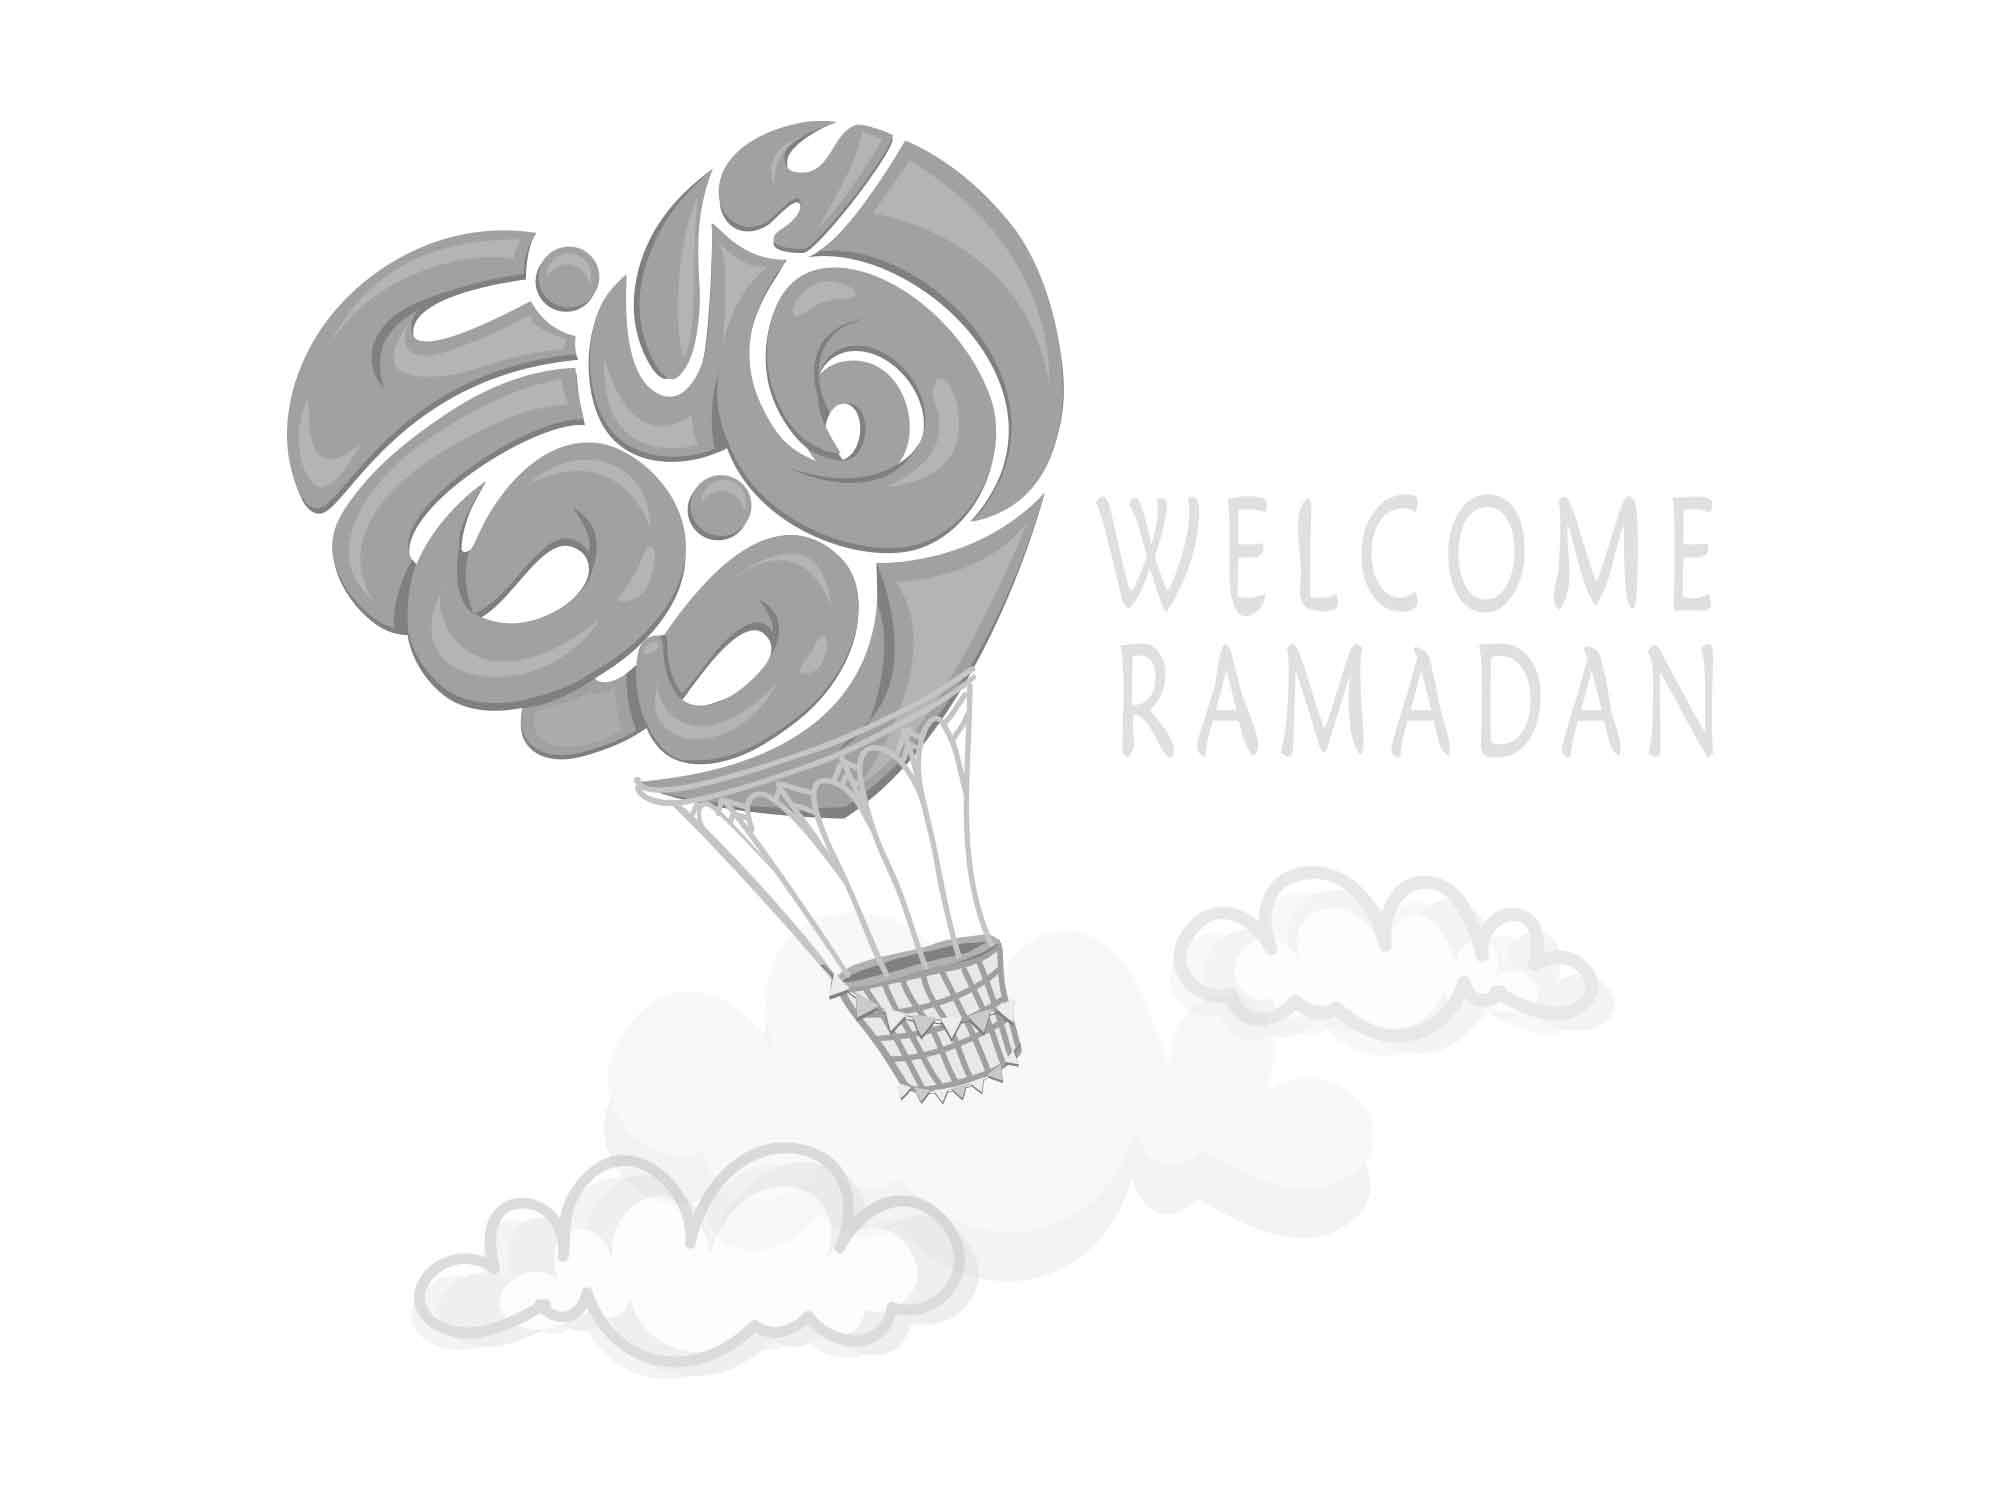 Ramadan Kareem Typography 6